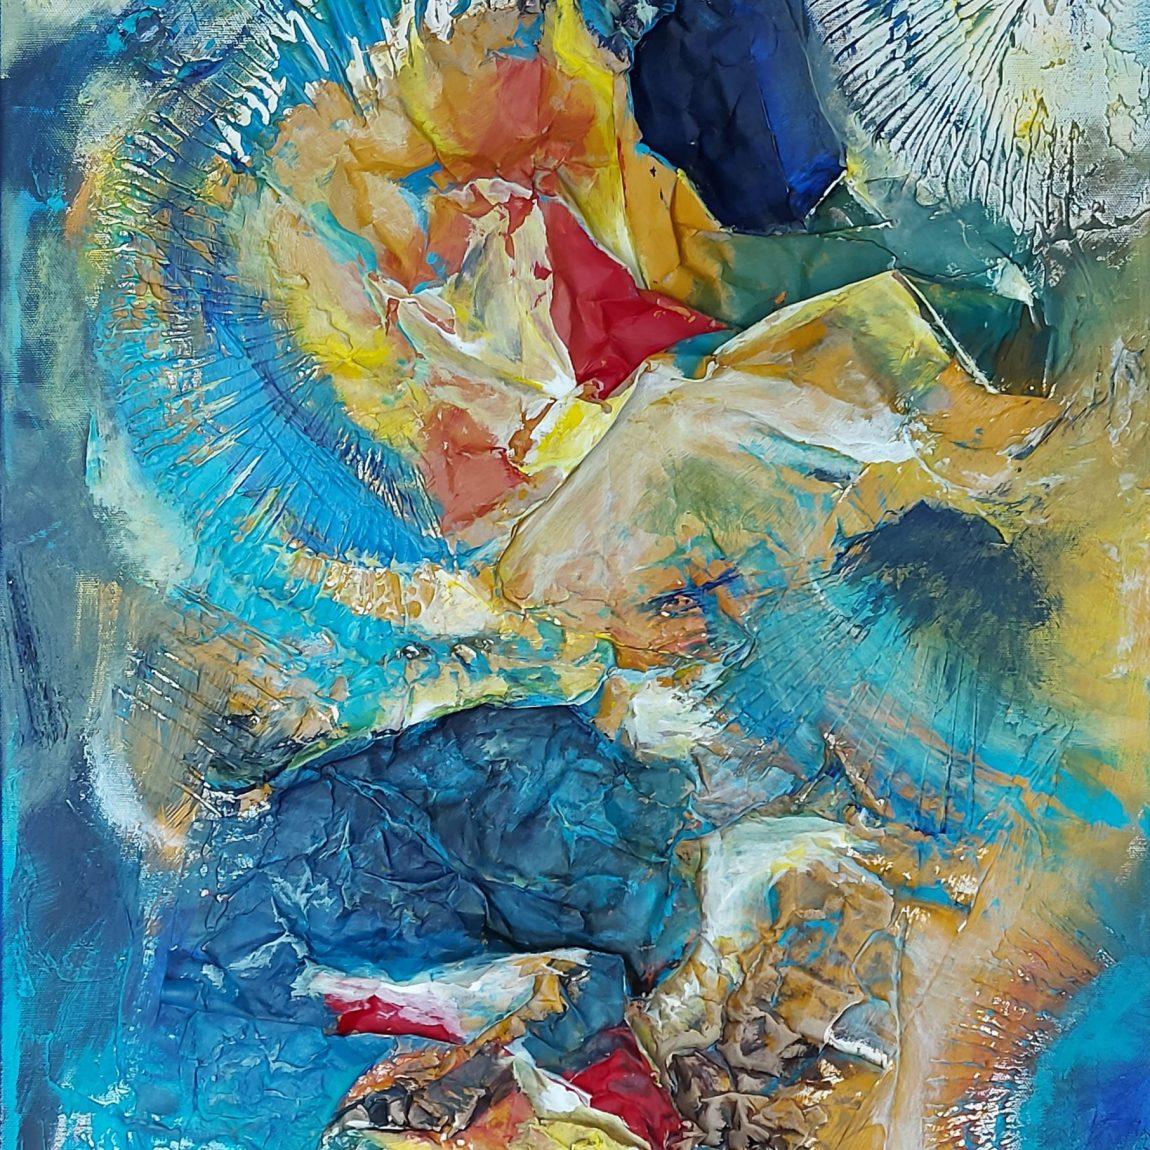 ALEV DUMLUPINAR - Eser Adi: Spirit of ocean Teknik: Tuval Üzeri Akrilik Ölçü: 70 x 90 cm  Fiyat : 2.065 TL